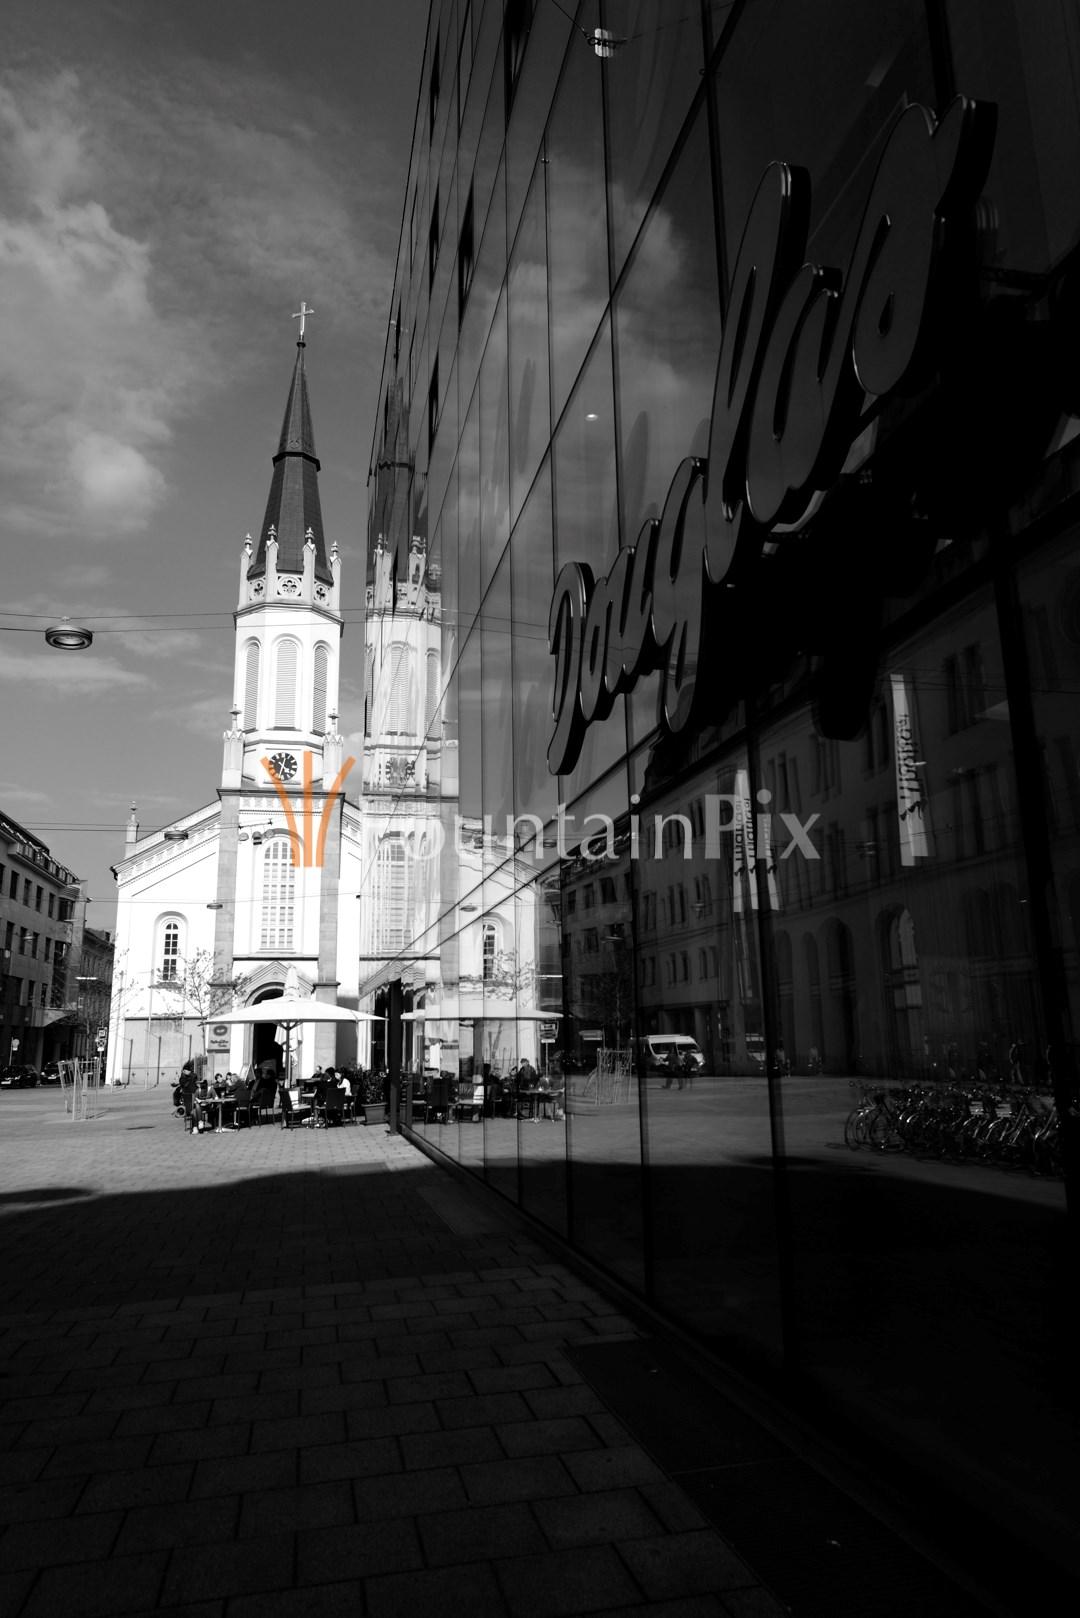 13: Martin-Luther-Platz